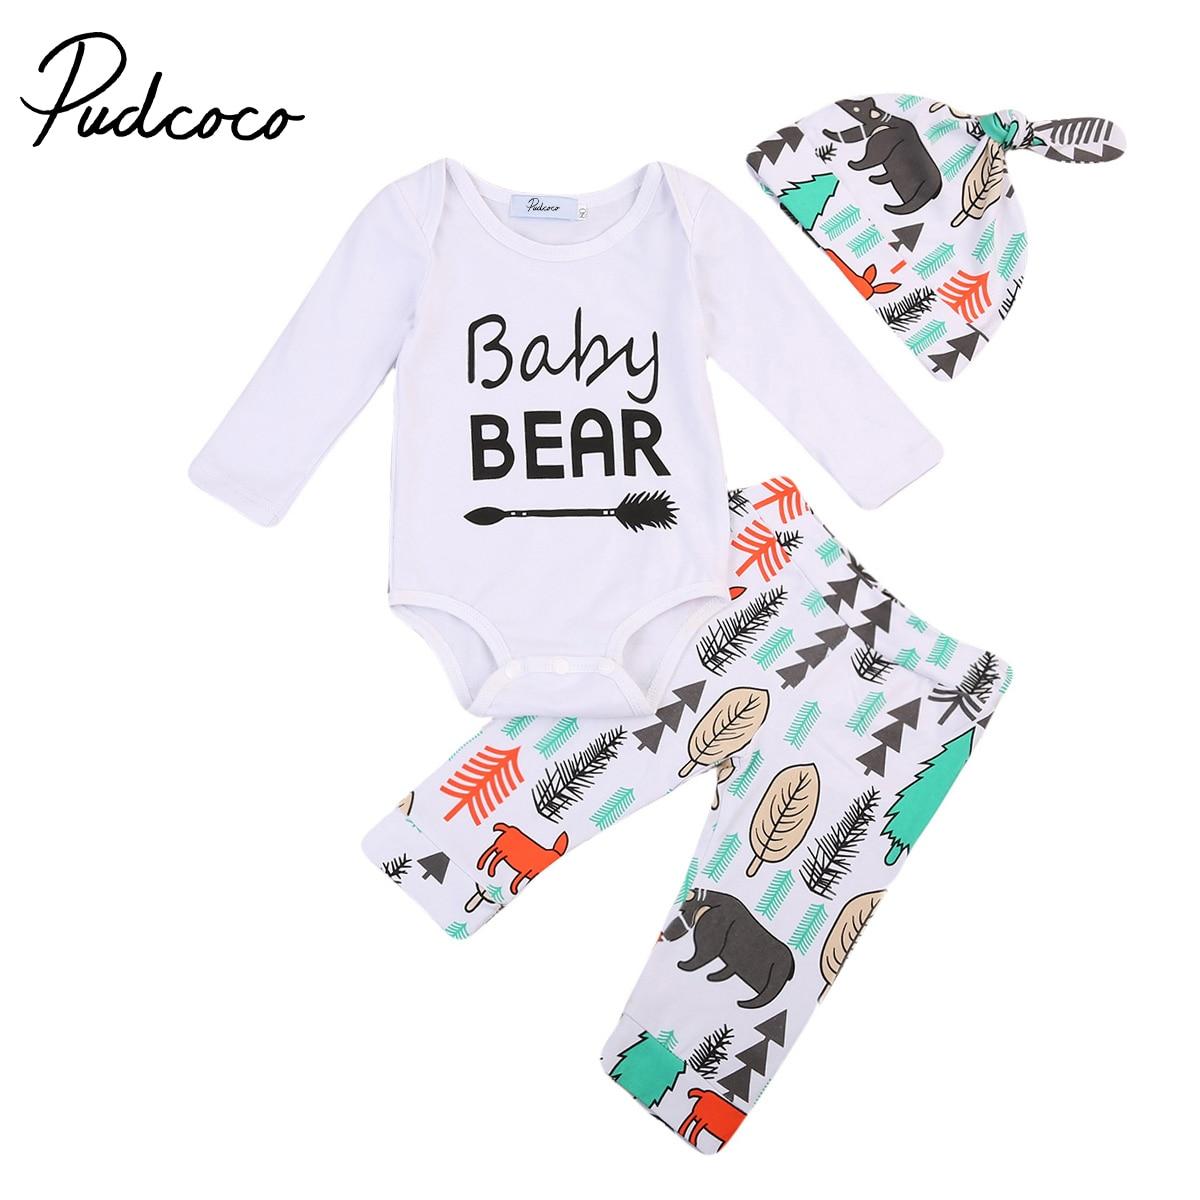 500edbd0d 3Pcs Newborn Baby Suits Lovely Kids Baby Unisex Long Sleeve Jumpsuit ...